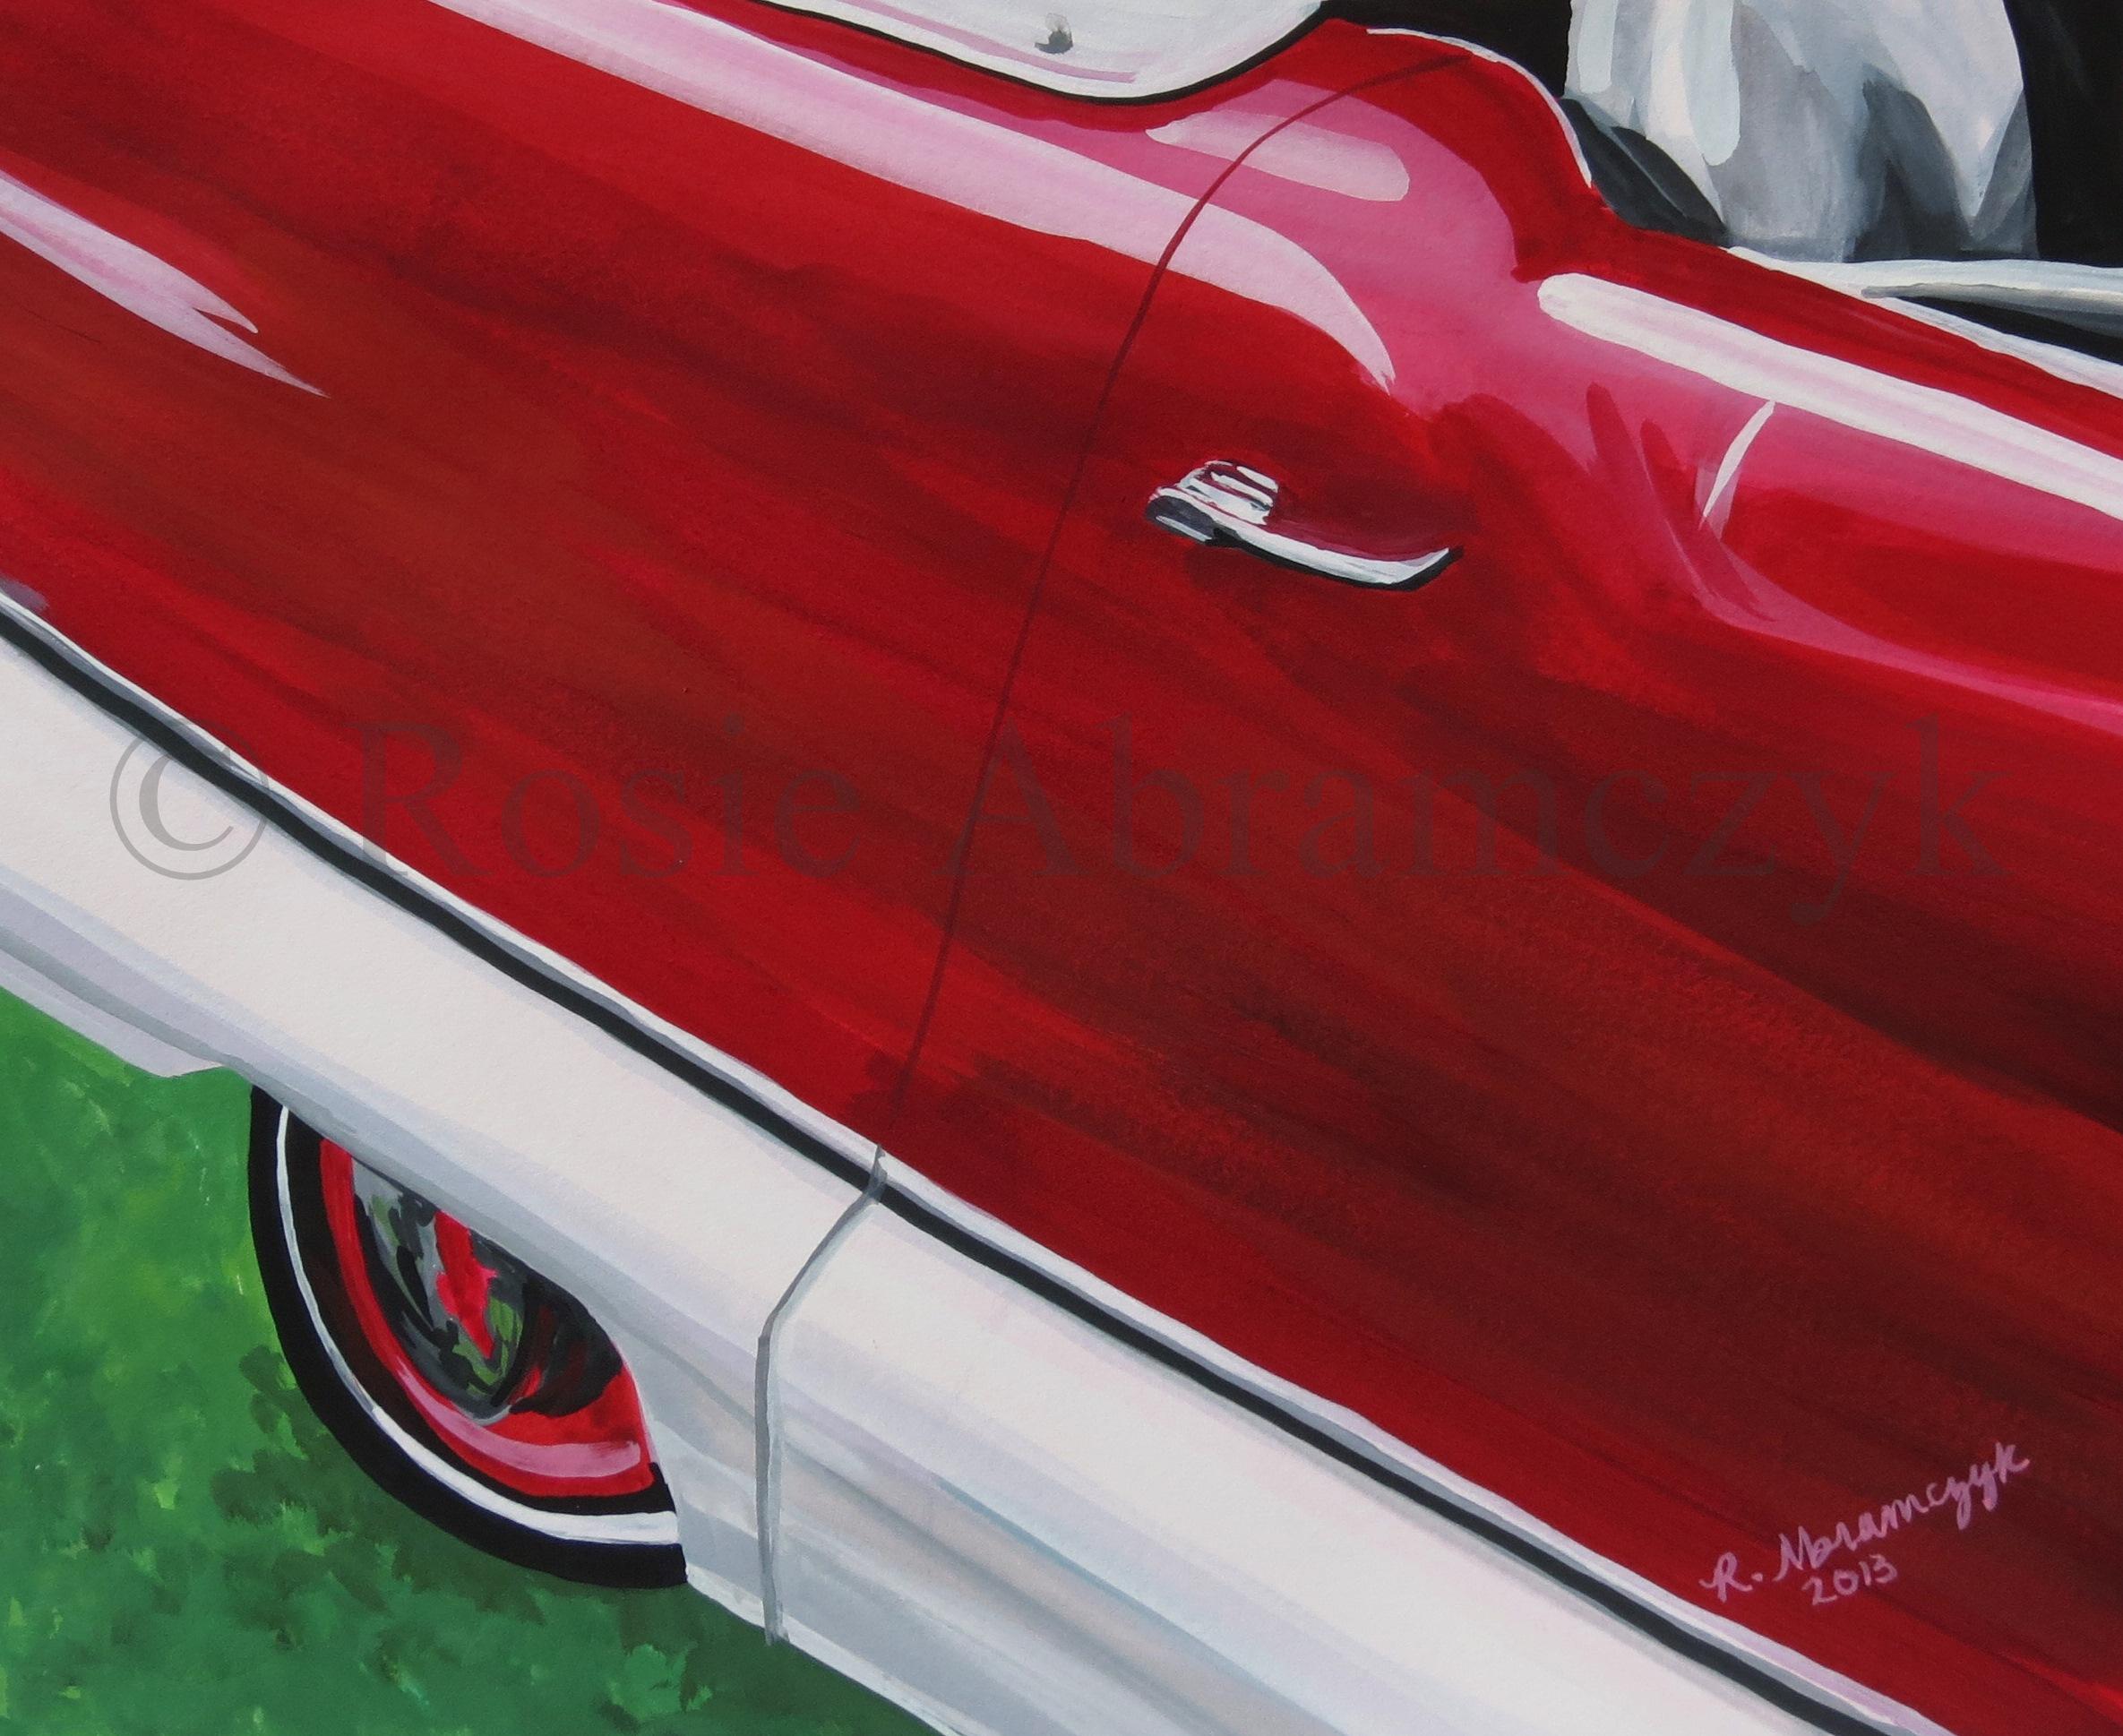 1959 Nash Metropolitan, by Rosie Abramczyk, Gouache Paint, 2013